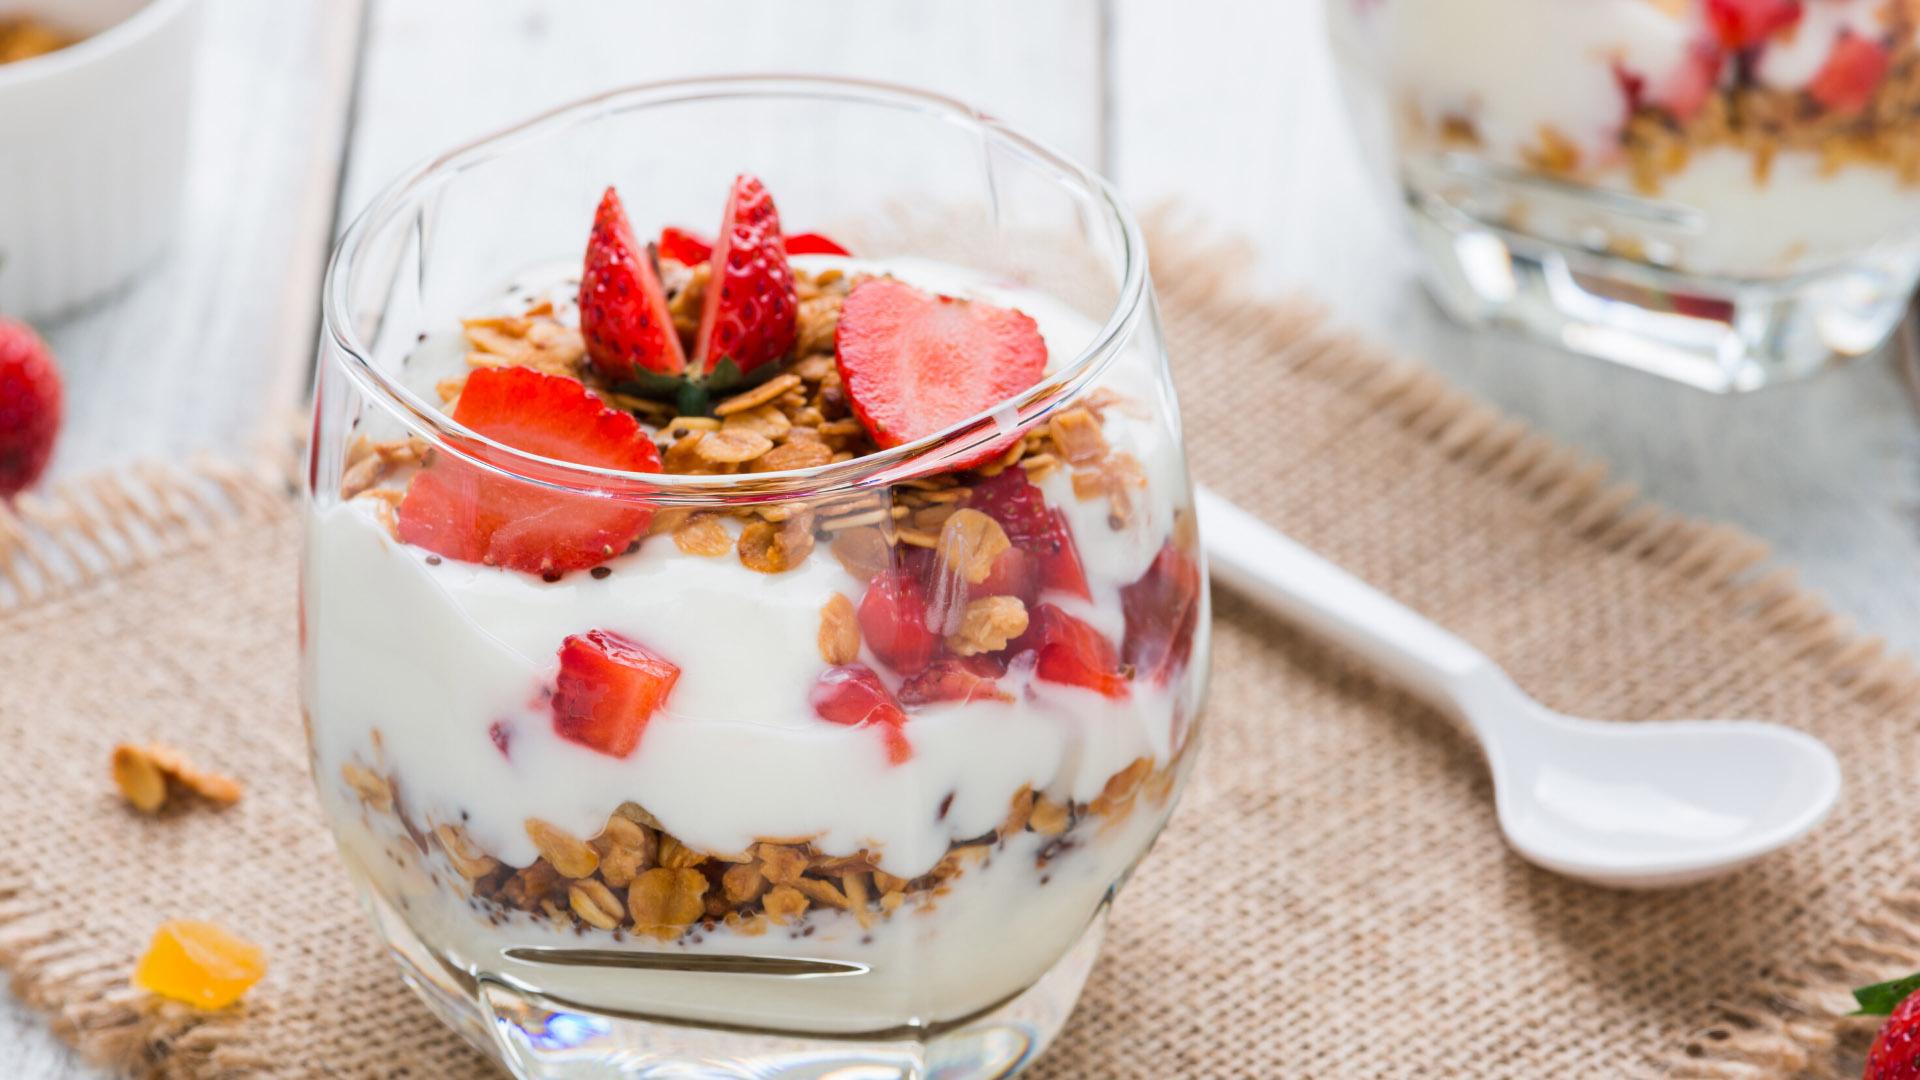 Image of Yogurt and Granola Trifle